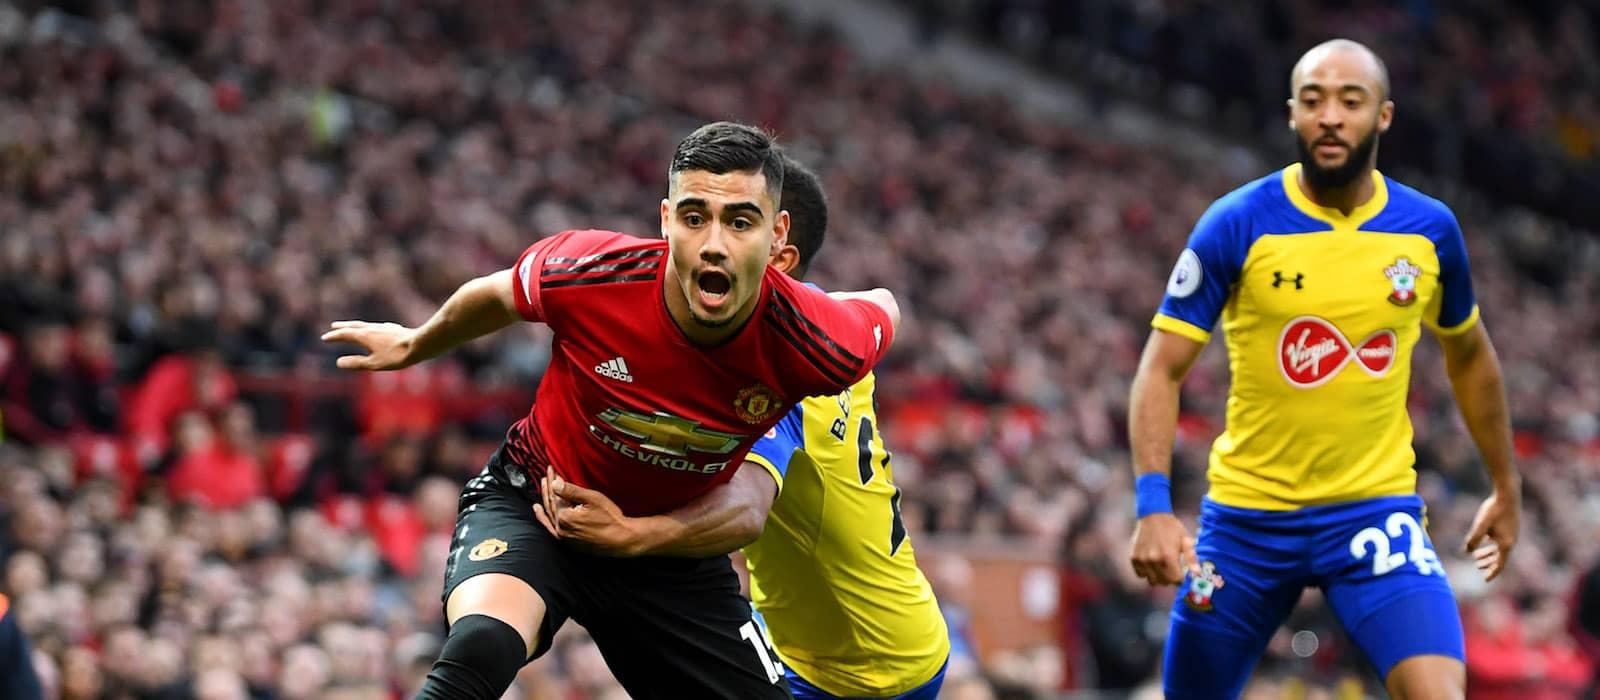 Predicted Xi Manchester United Vs Watford